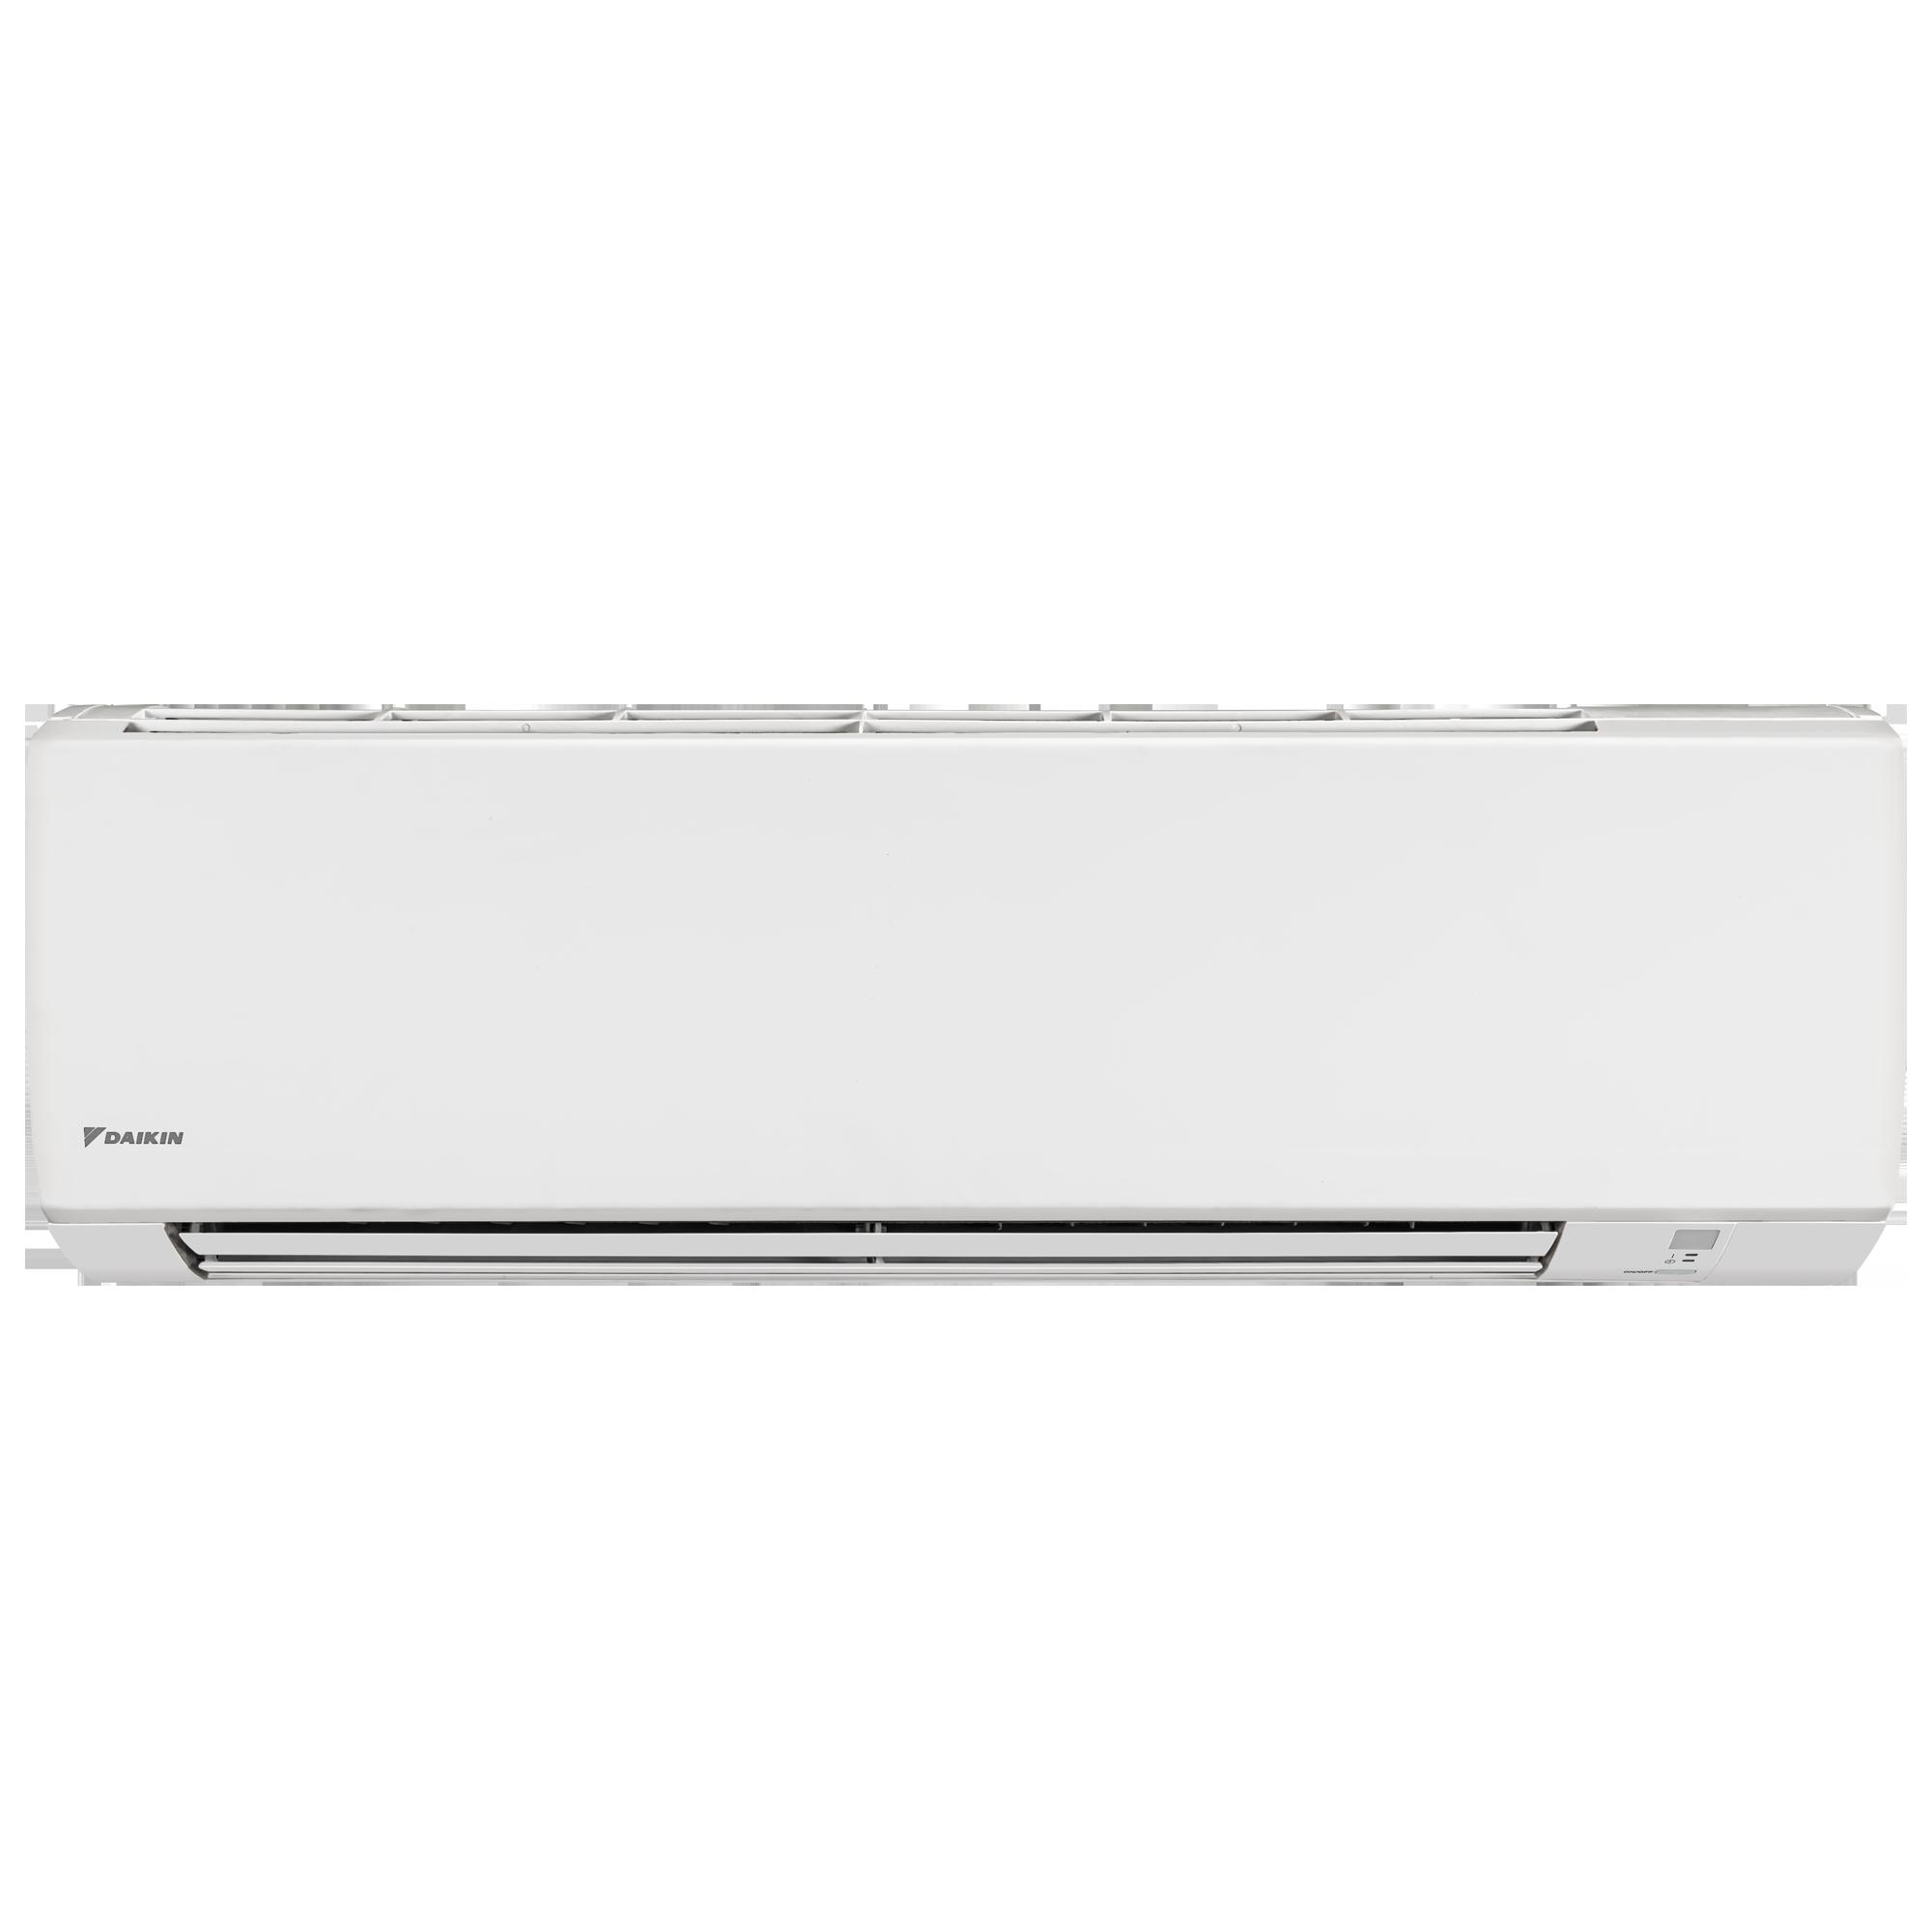 Daikin 1.5 Ton 3 Star Inverter Split AC (Copper Condenser, ATKL50TV, White)_1